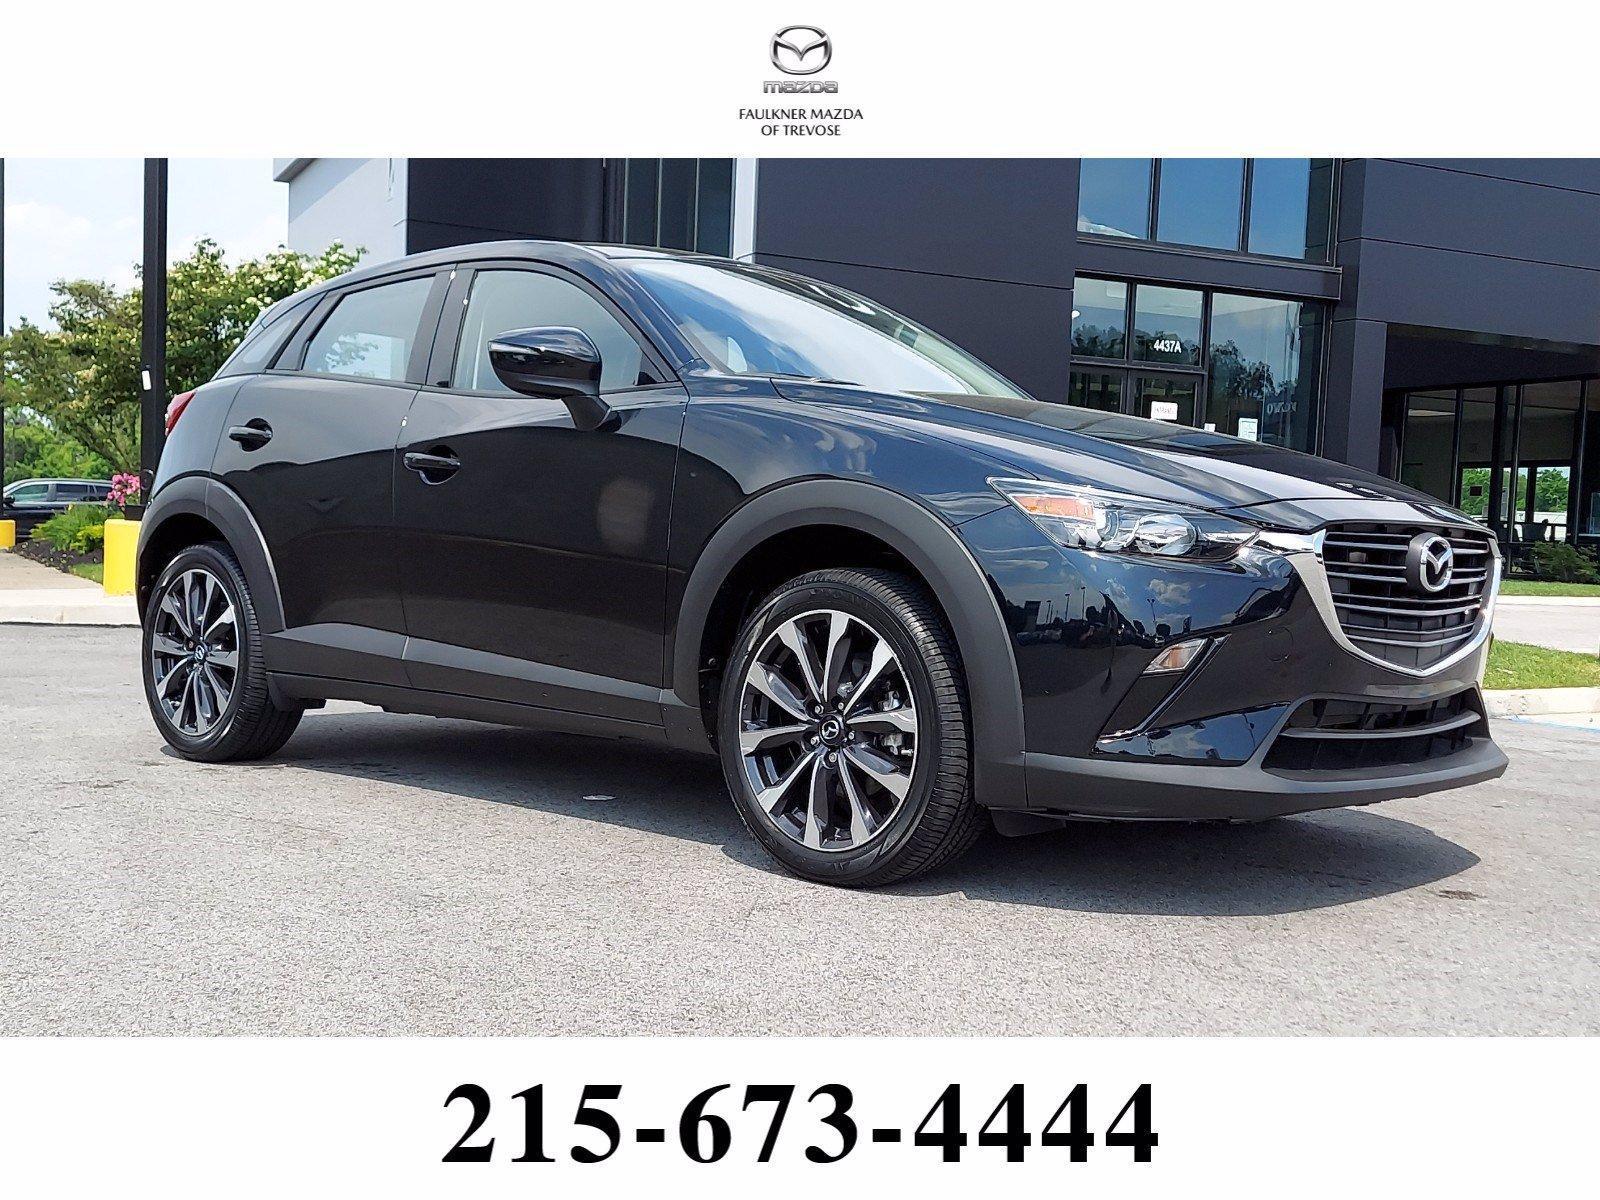 2019 Mazda CX-3 Vehicle Photo in Trevose, PA 19053